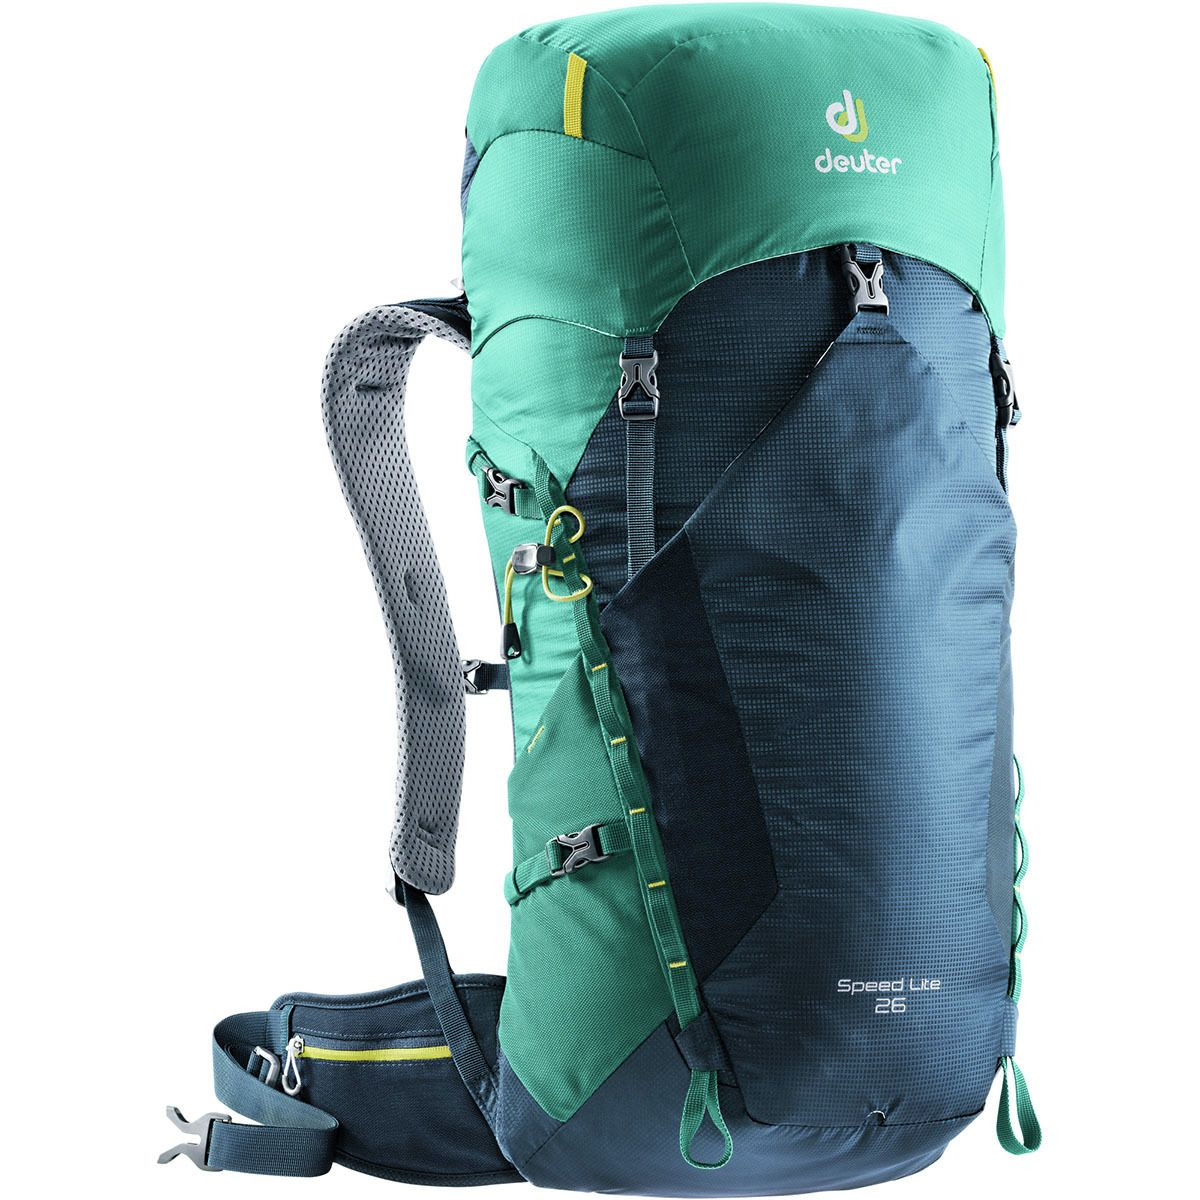 Deuter Speed Lite 26L Backpack Navy-Alpinegreen, One Size